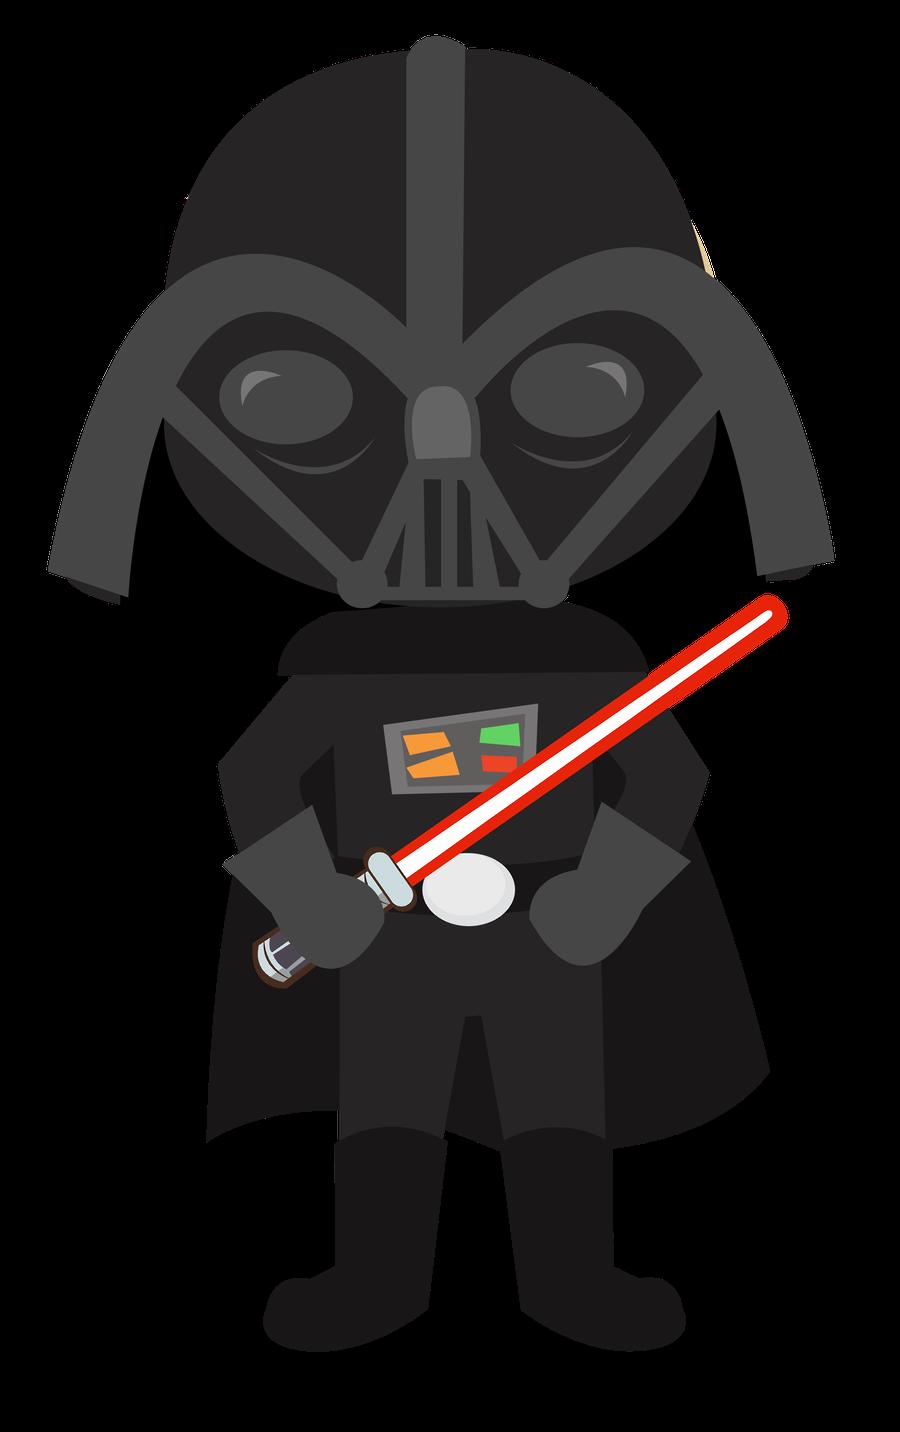 Darth Vader Clipart Clip Arts For Free Download On Png Darth Vader Clipart Darth Vader Drawing Darth Vader Png